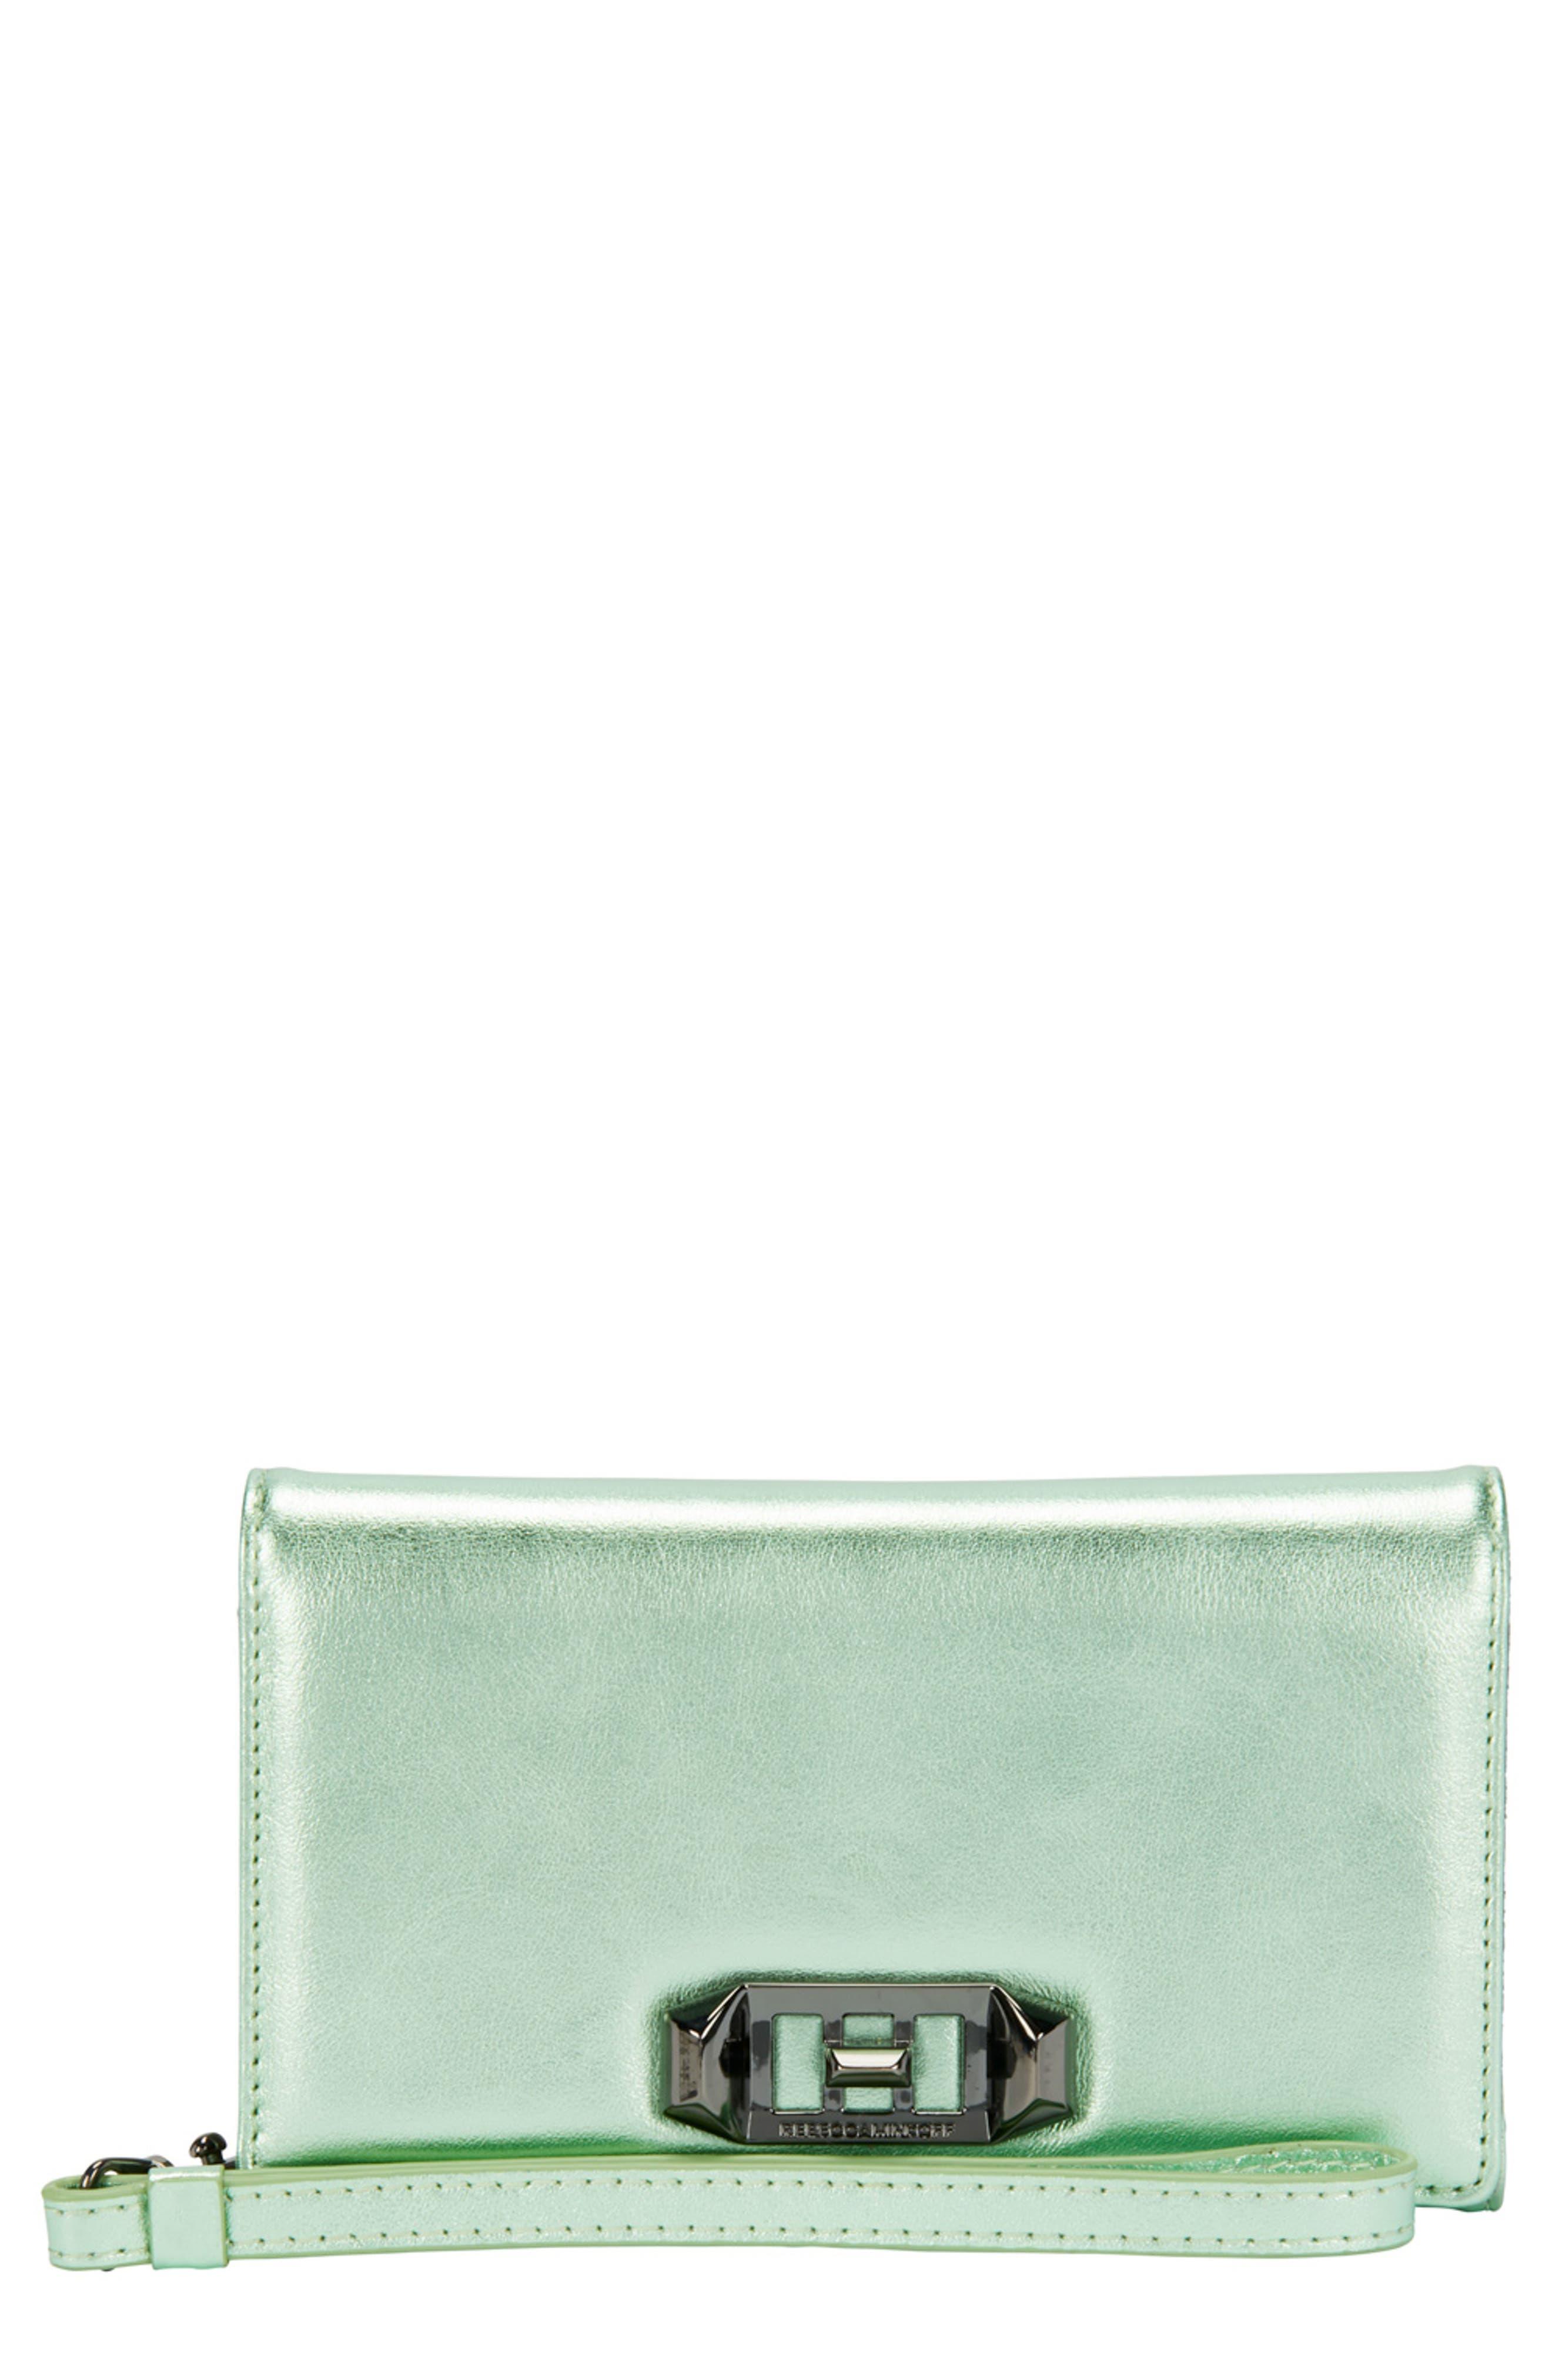 Main Image - Rebecca Minkoff Love Lock iPhone X Leather Wristlet Folio